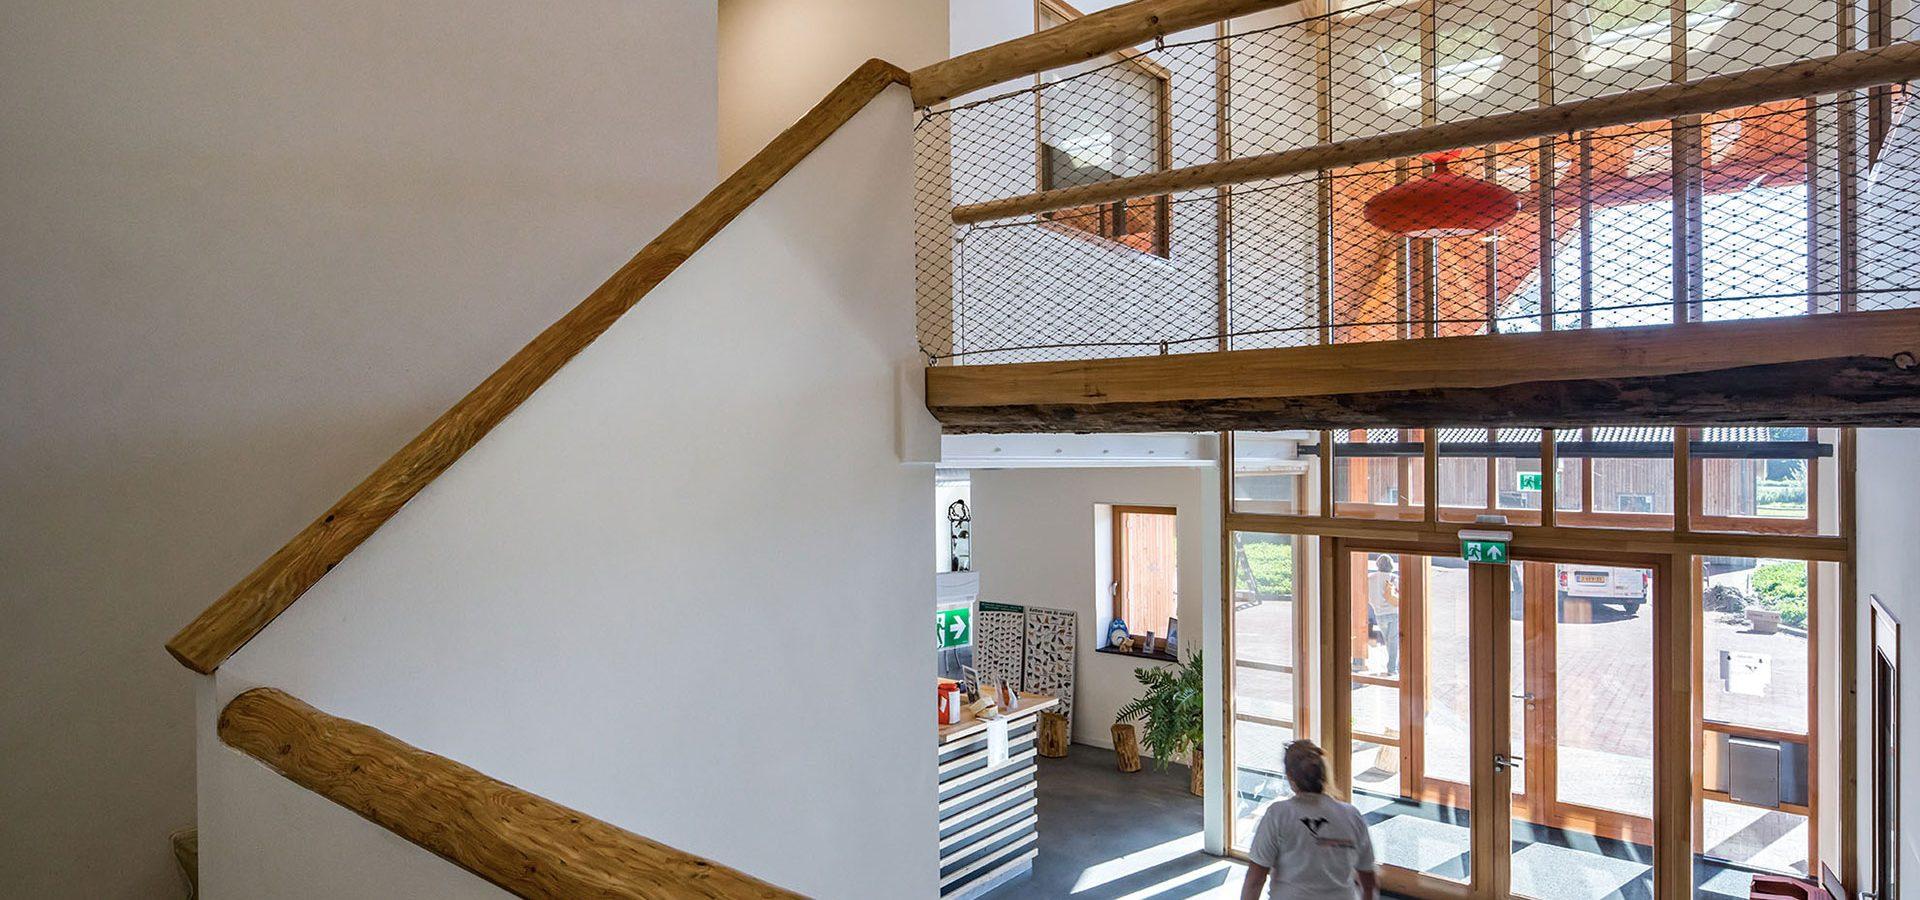 FARO architecten Dierenambulance Den Haag 05